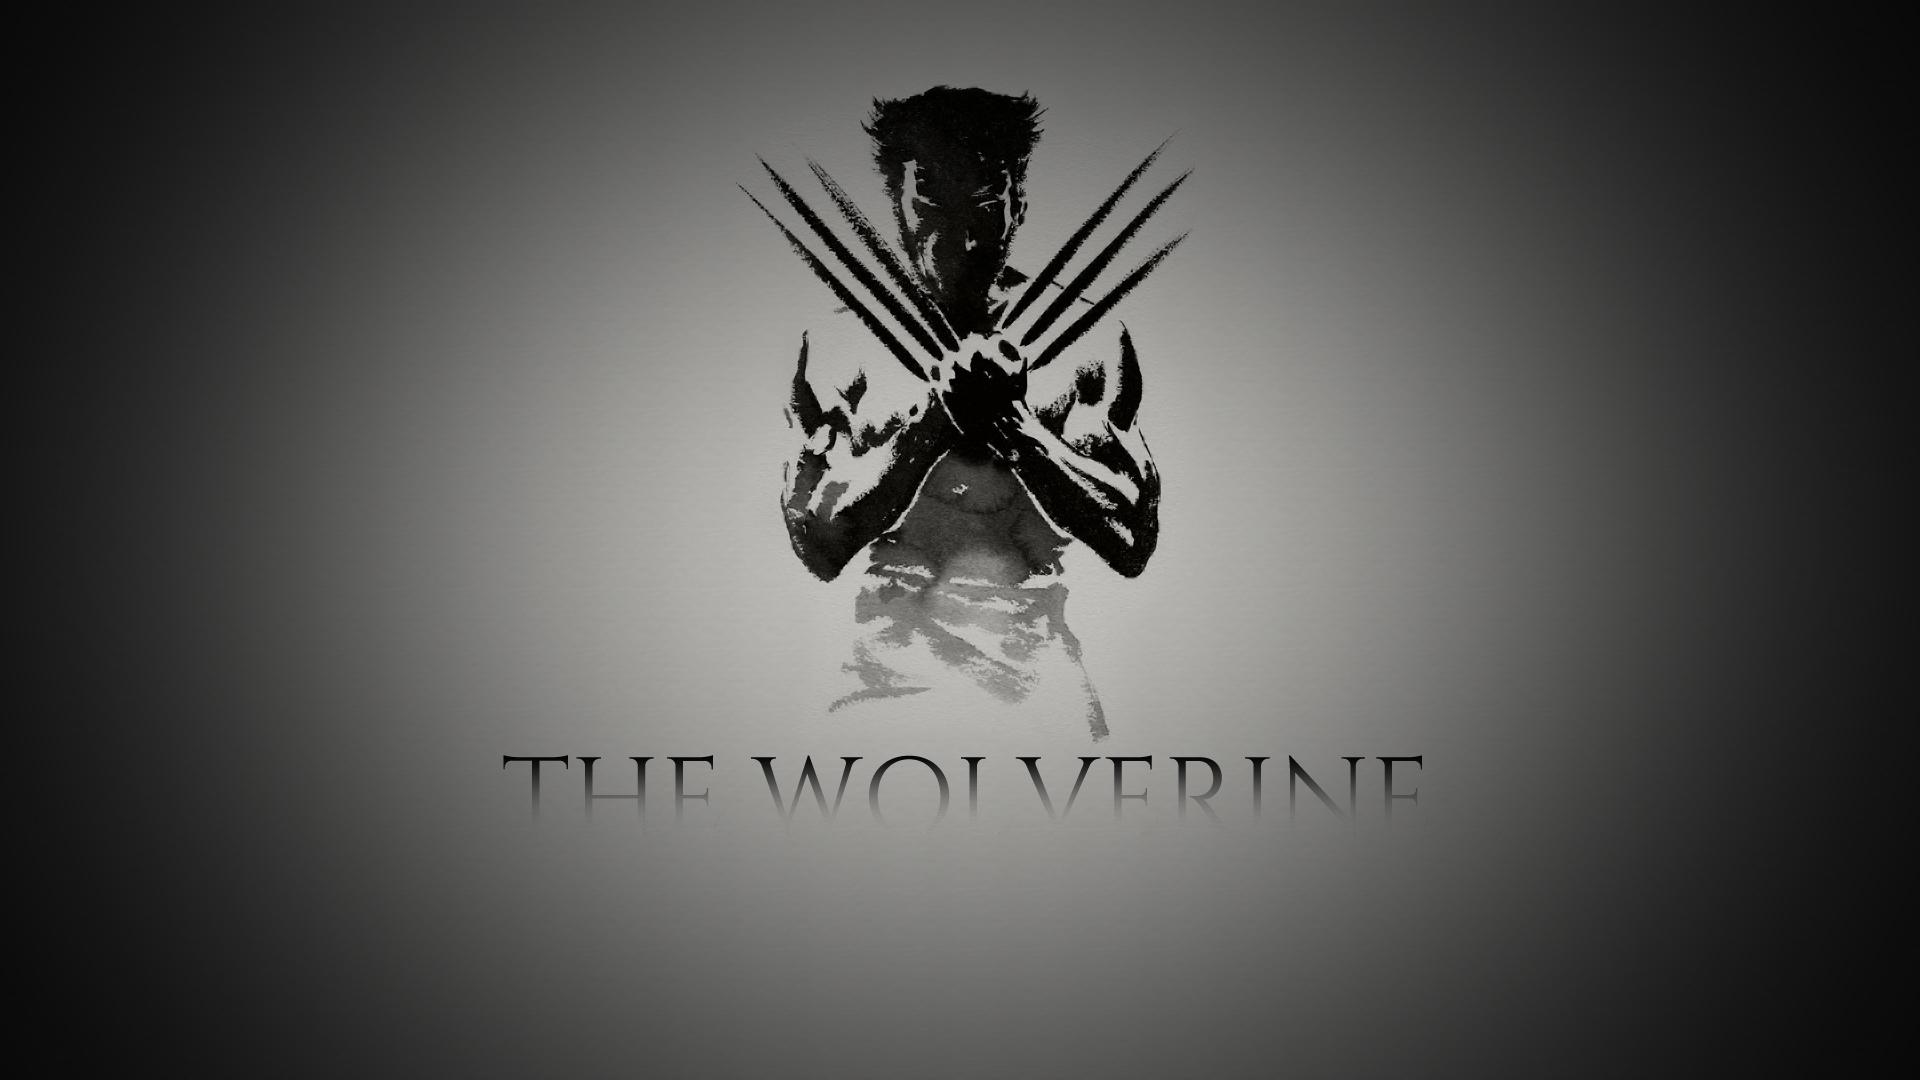 X Men Wolverine Art Hd